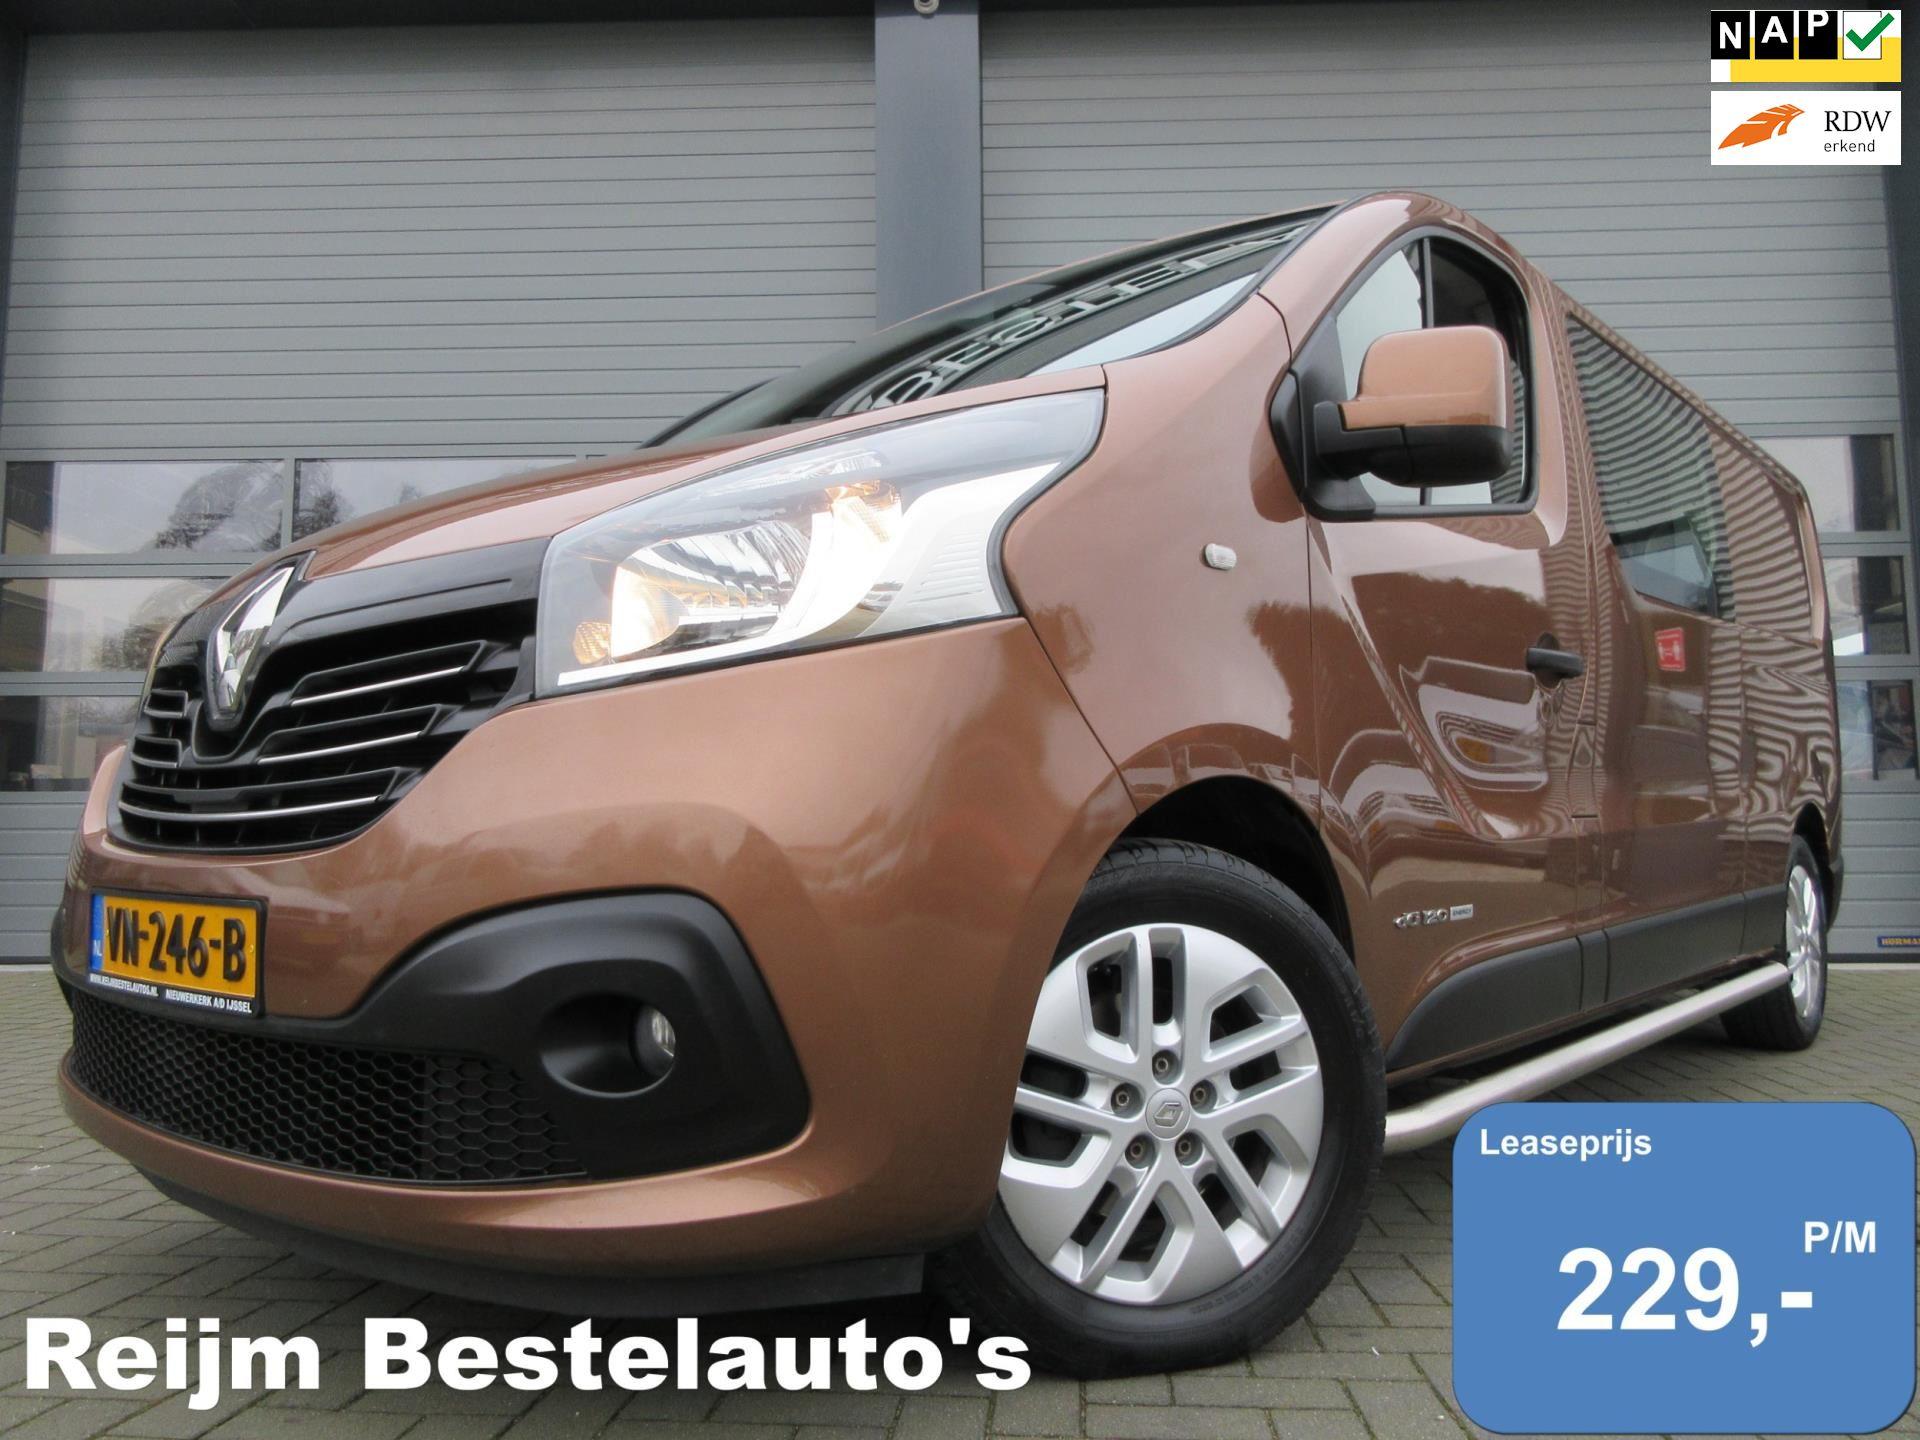 Renault Trafic occasion - Reijm Bestelauto's